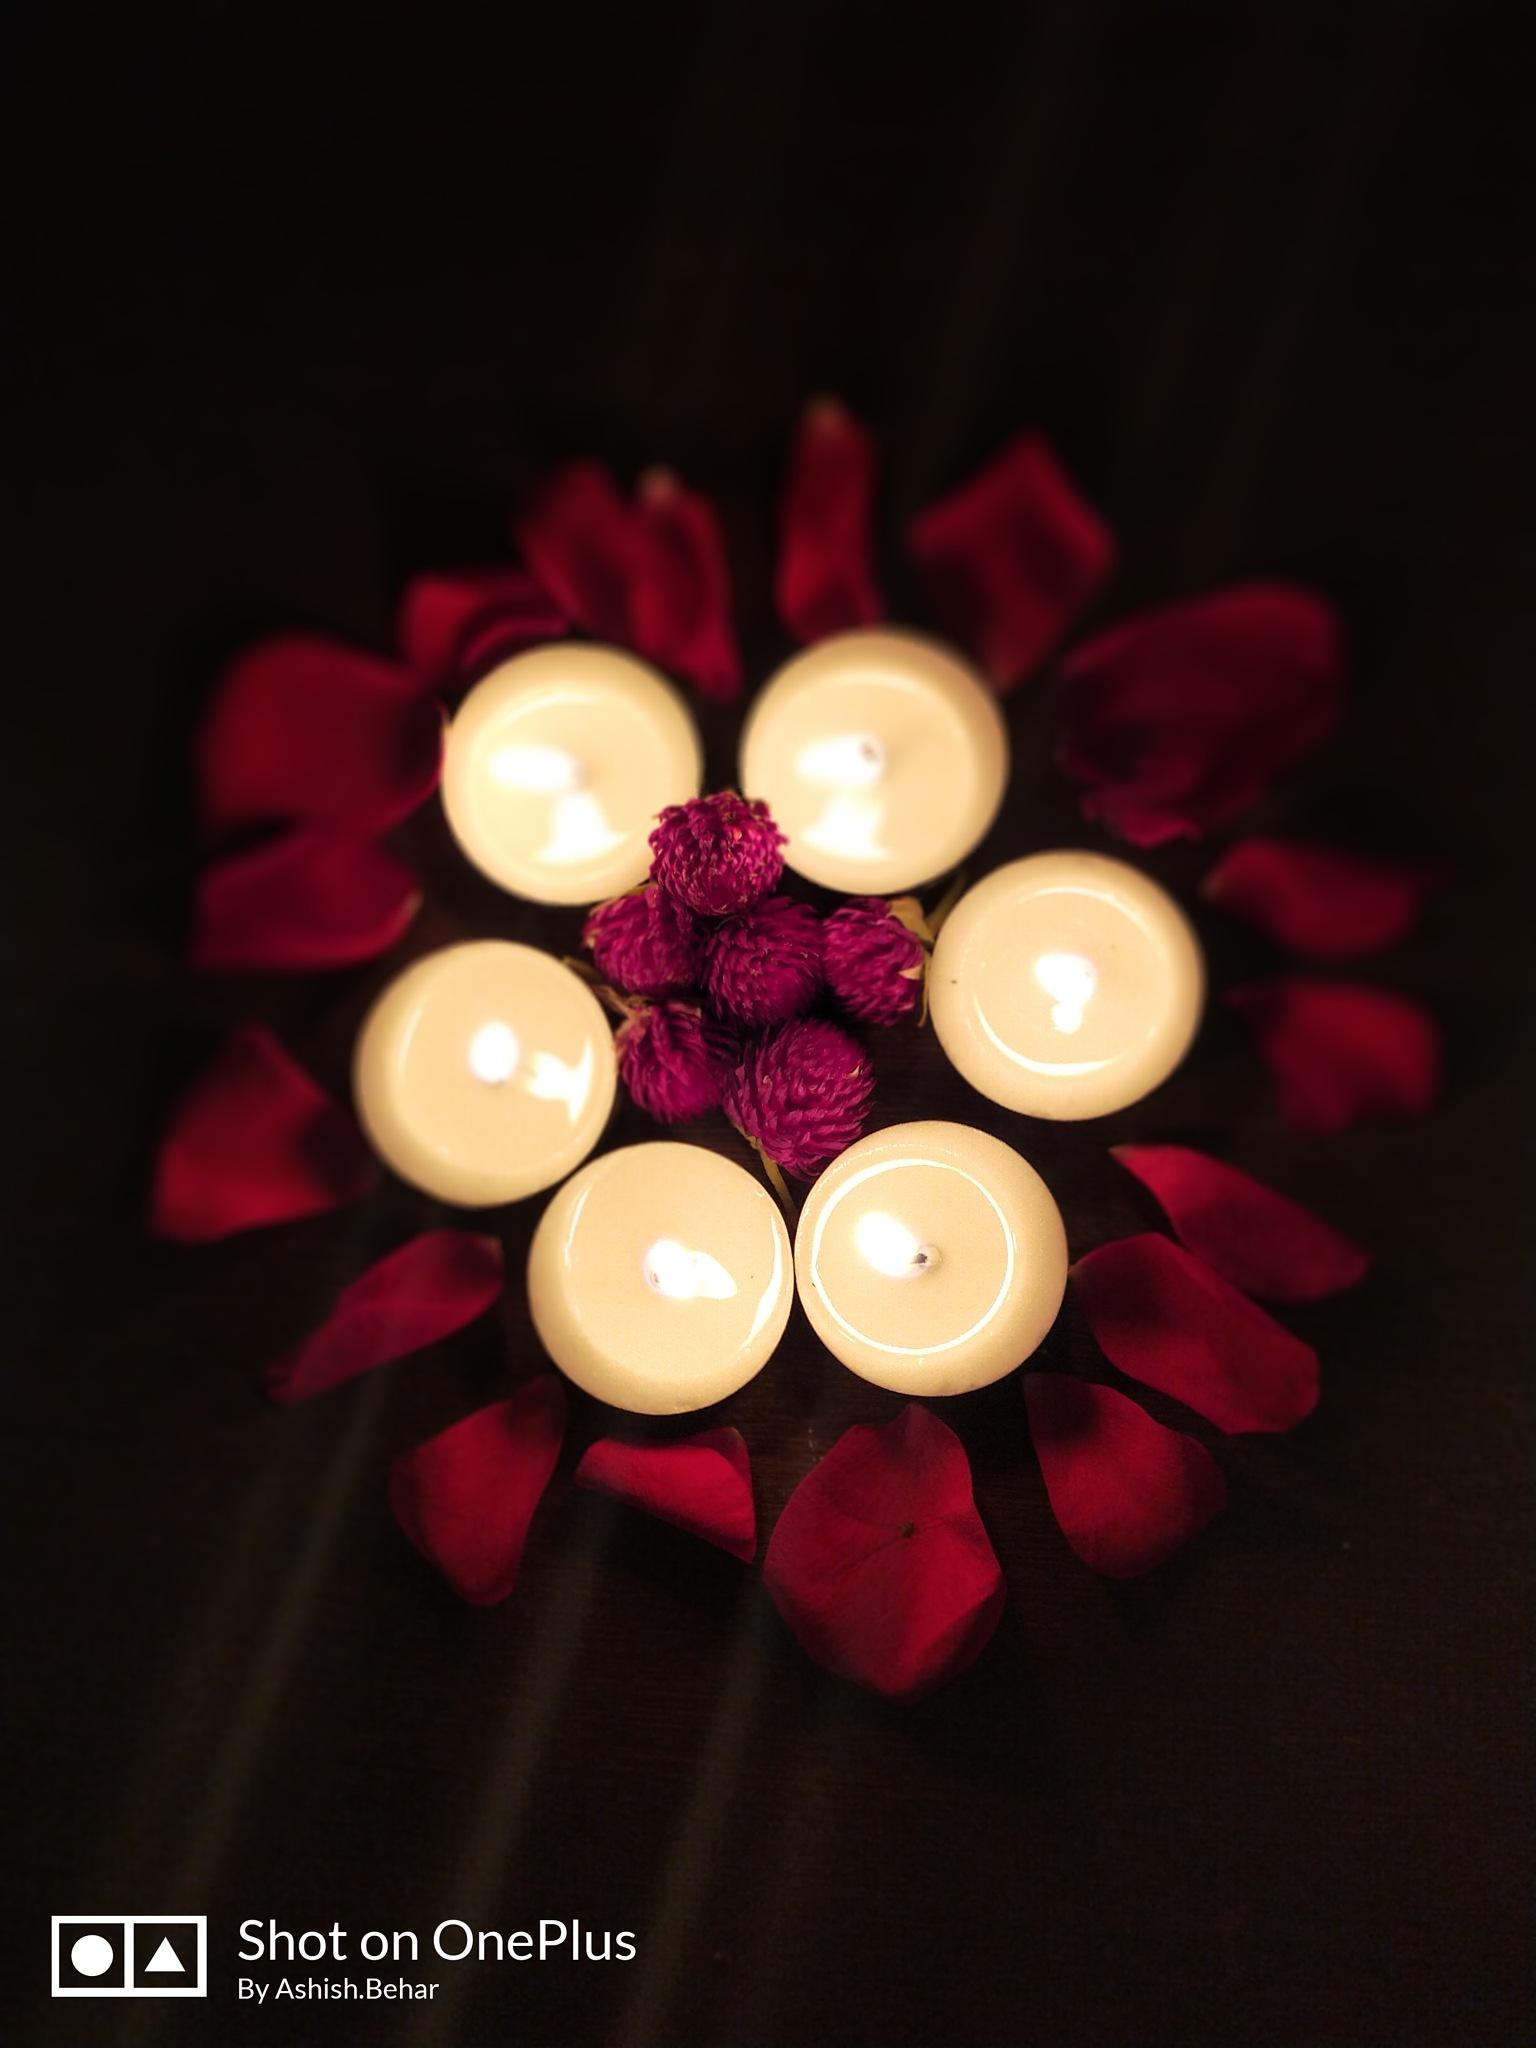 diwali time ..lights and flowet petals.. makes perfect sense by ashish